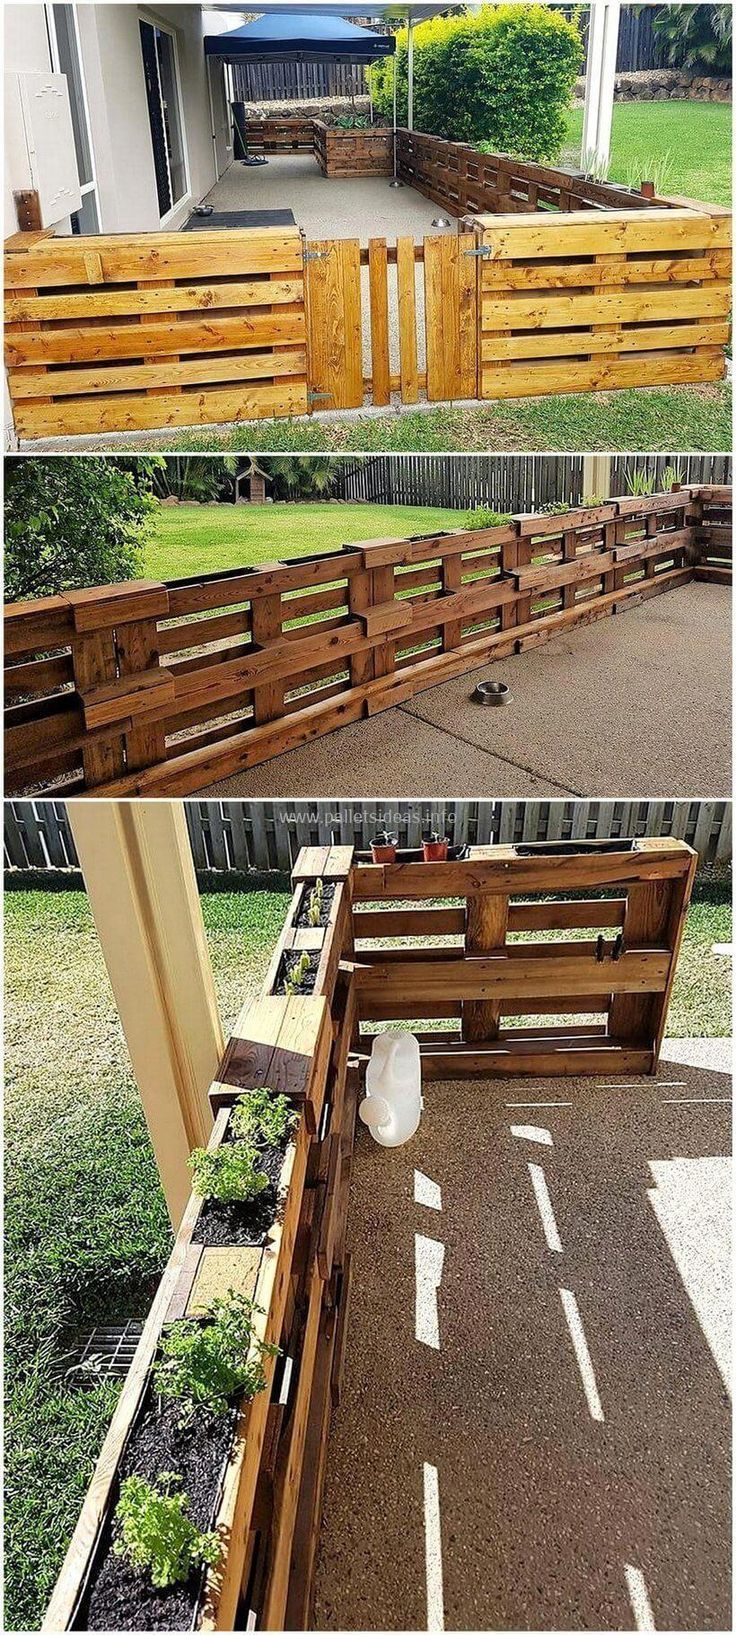 New Snap Shots backyard fence diy Popular